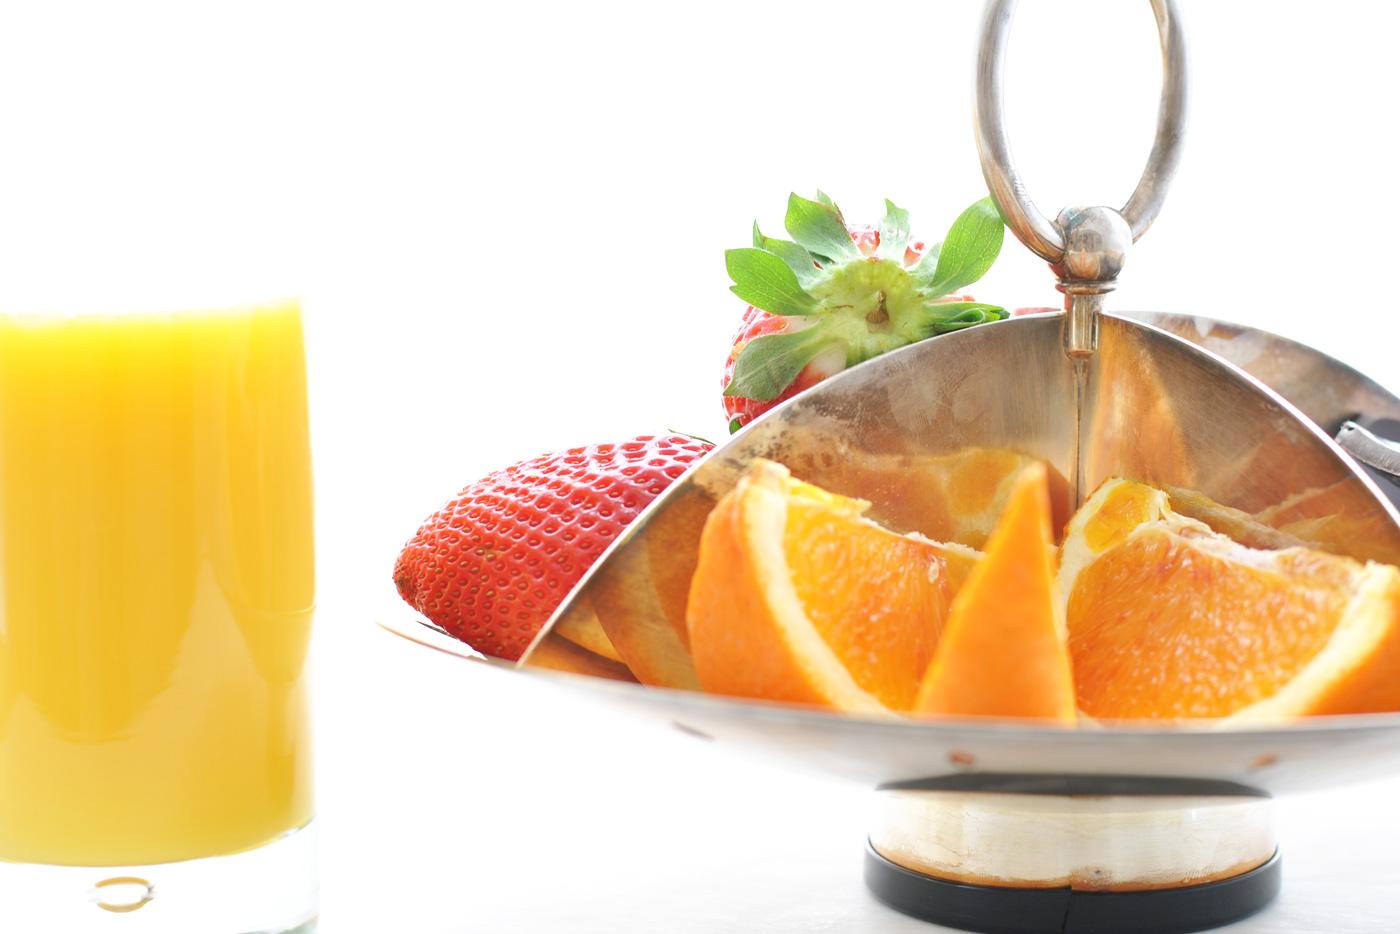 frutta e spremute fresche